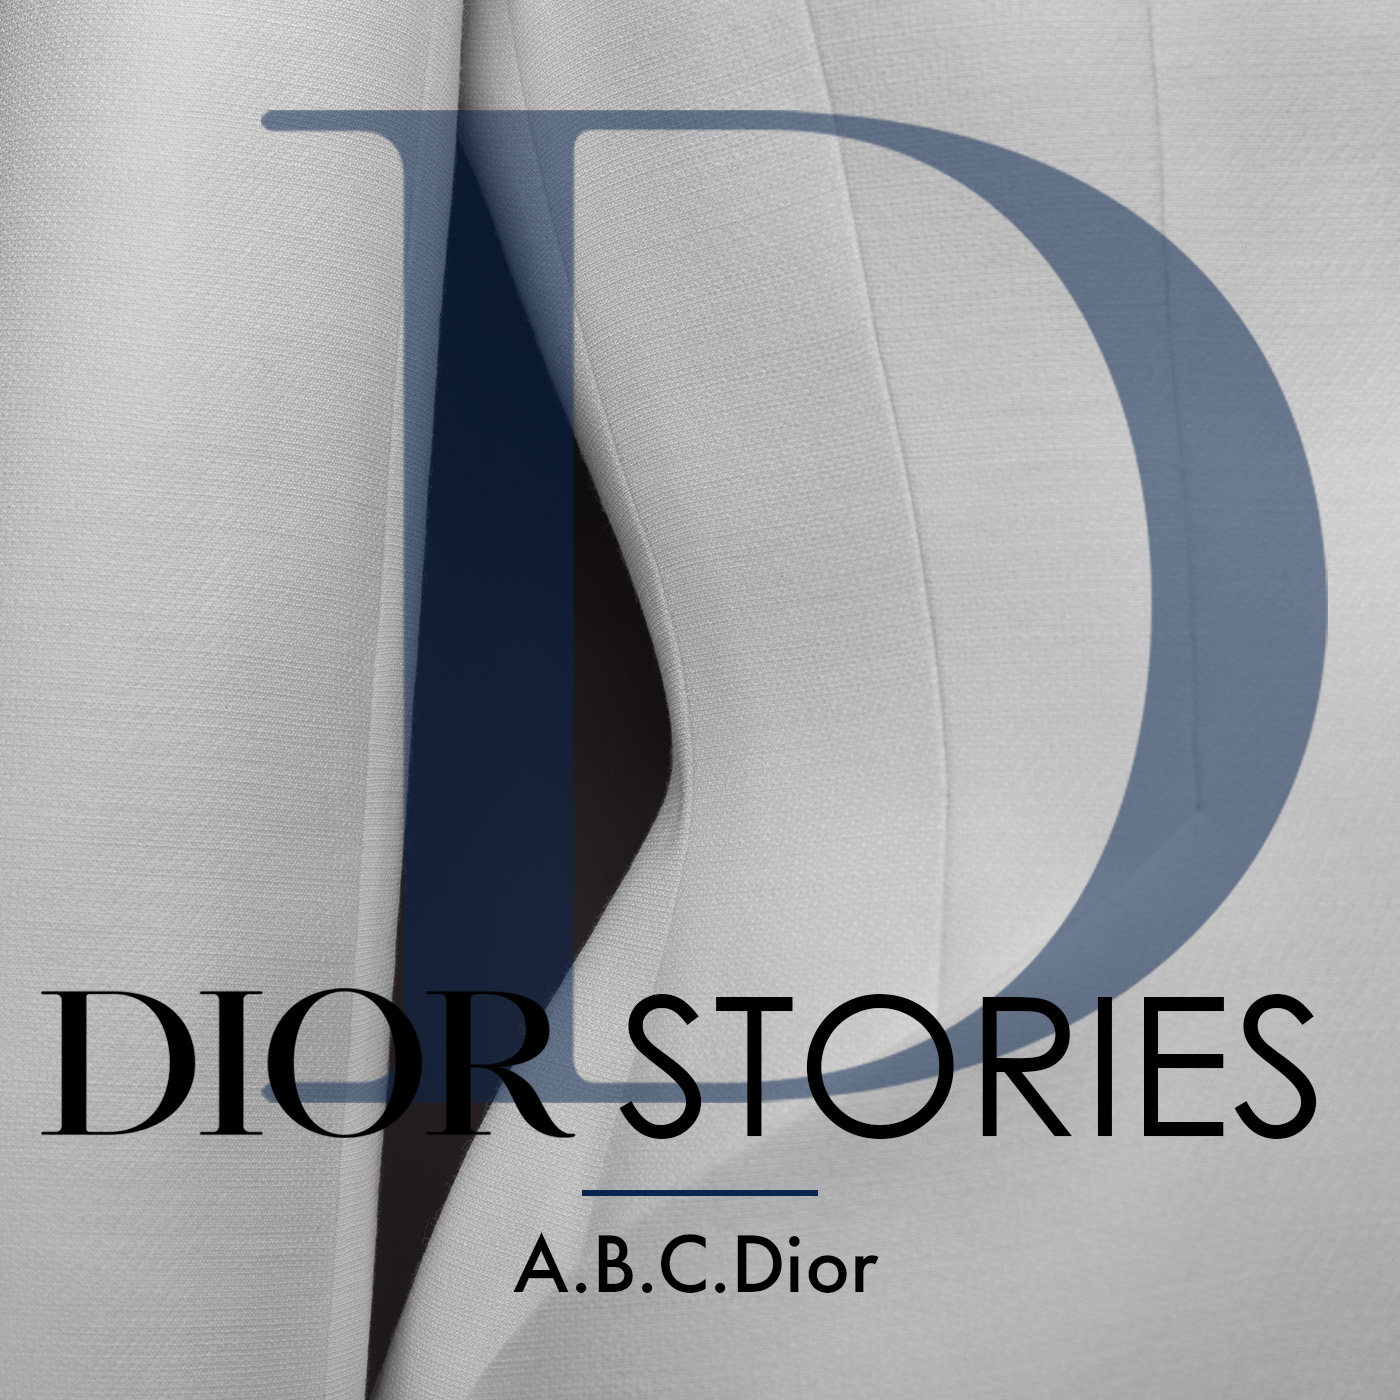 DIORSTORIES_A.B.C.DIOR podcast image